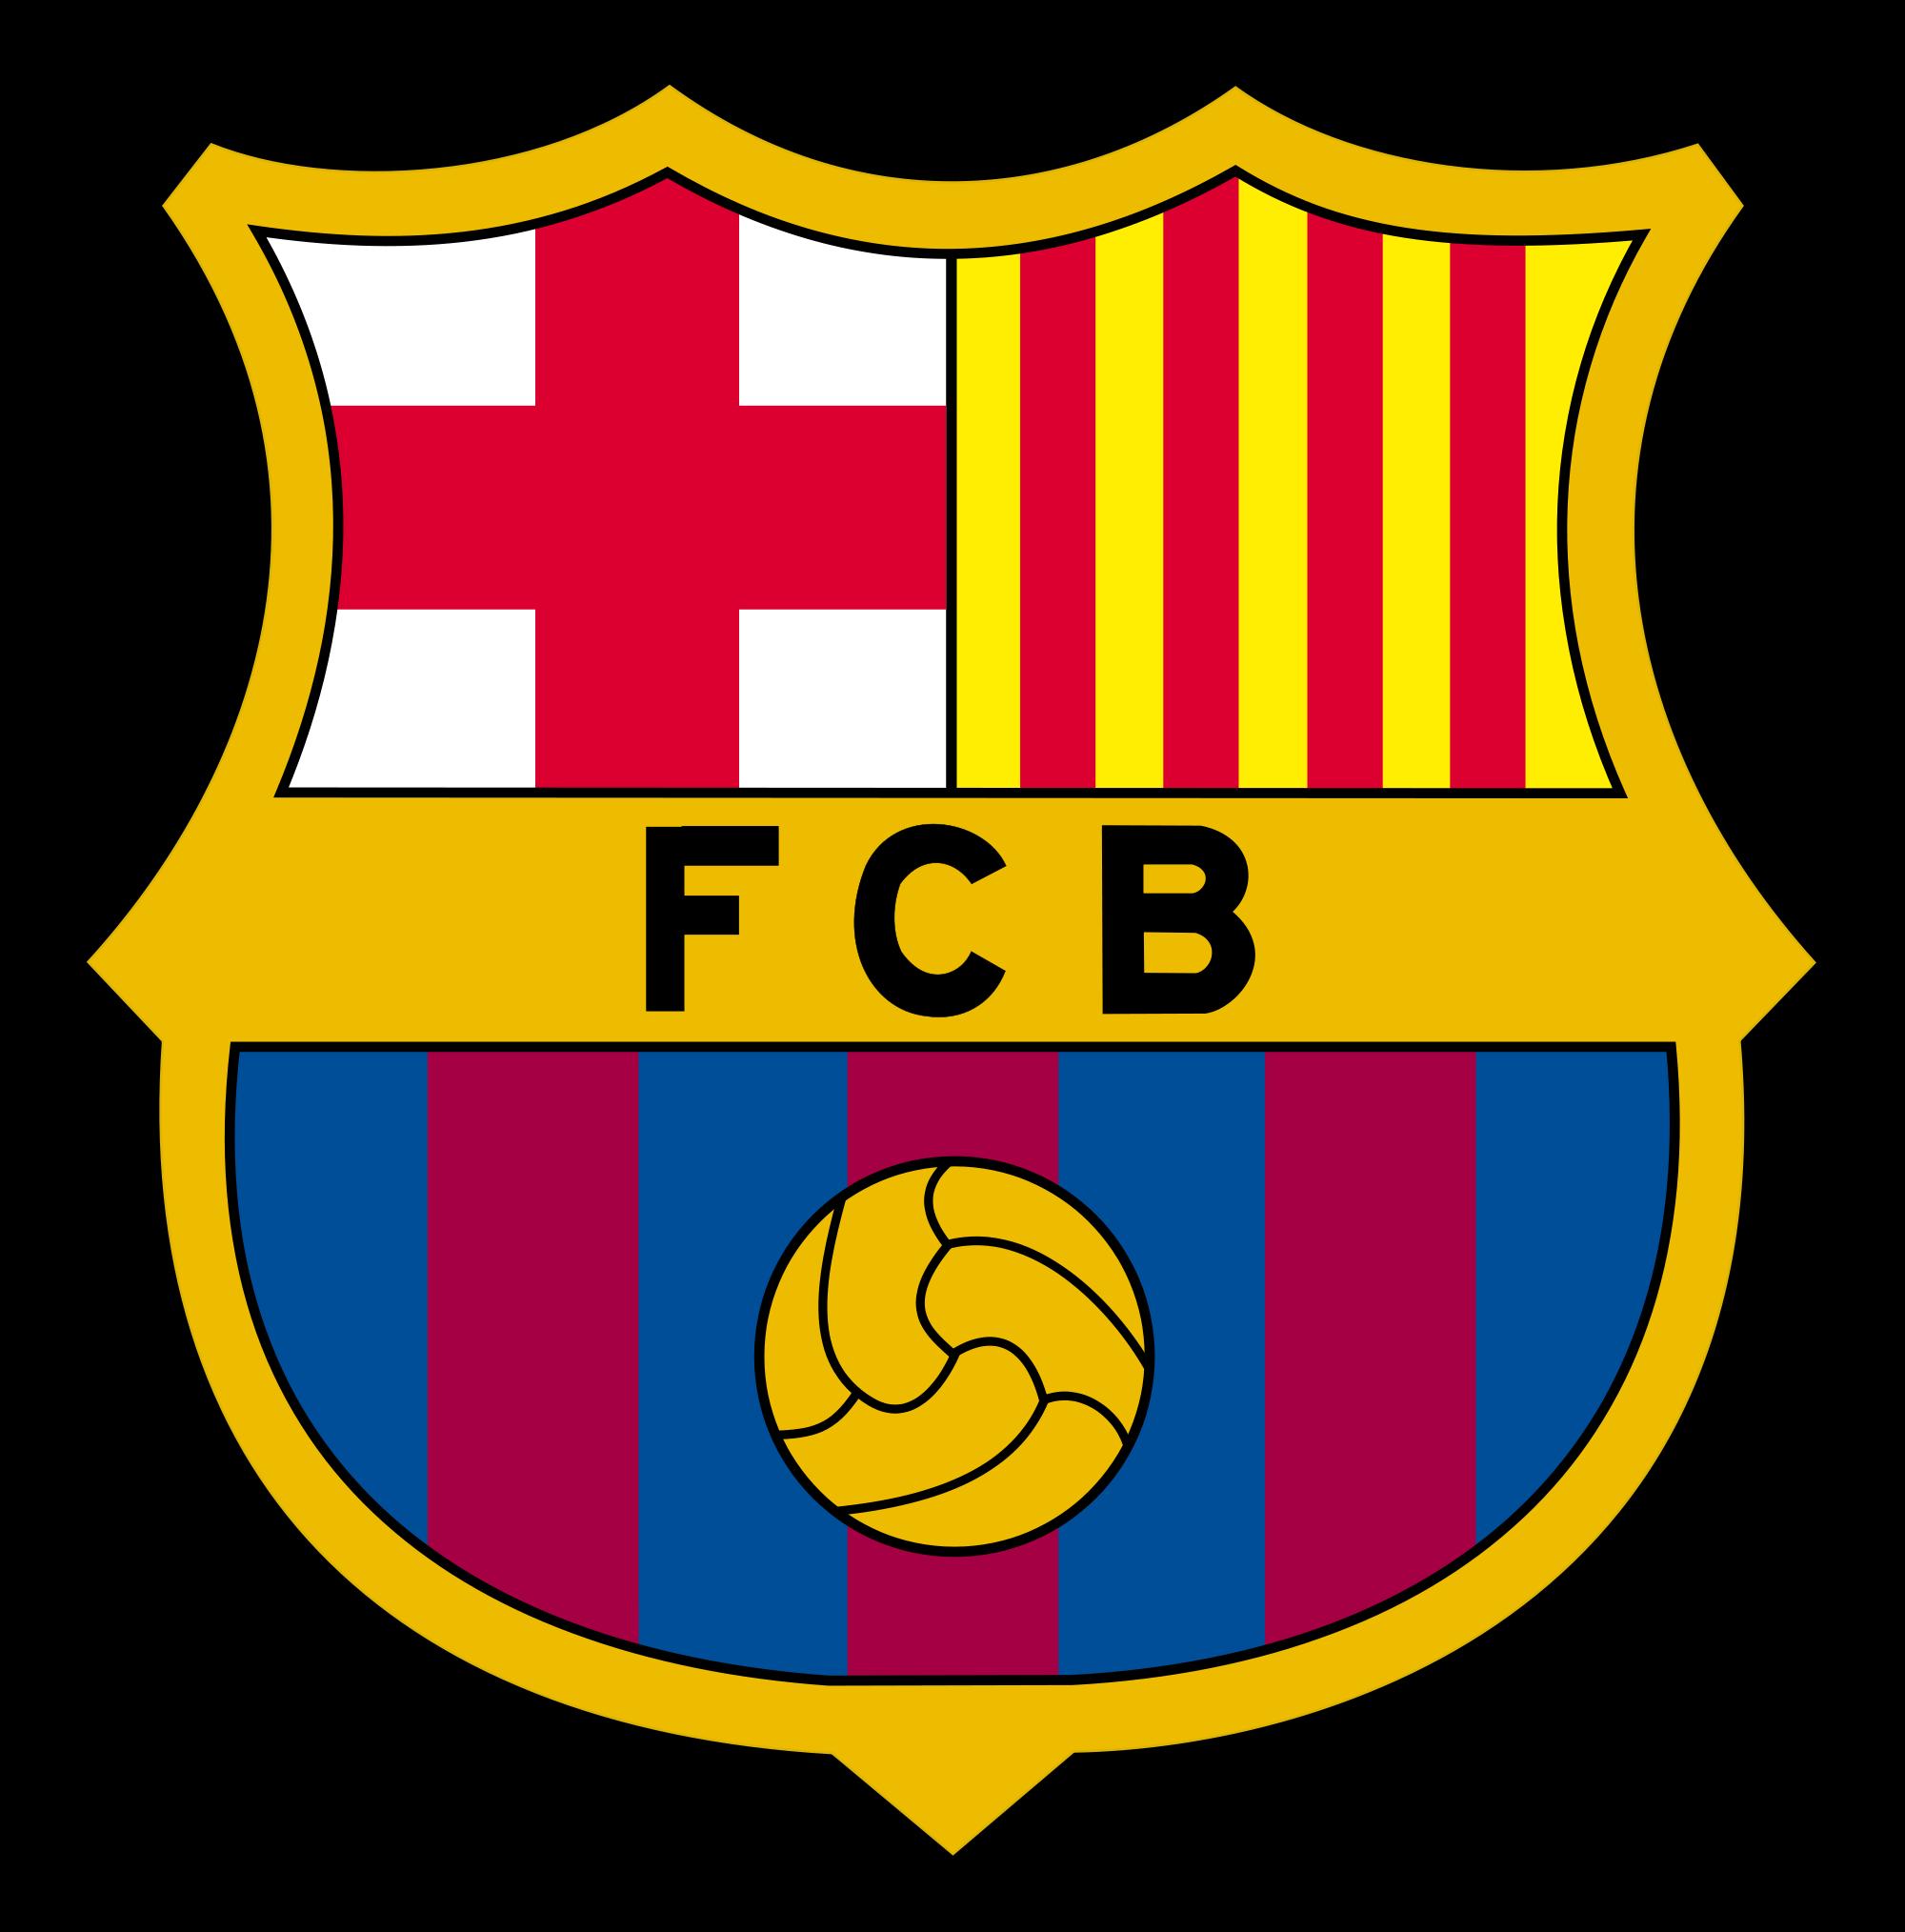 Fc Barcelona Clipart & Clip Art Images #31584.